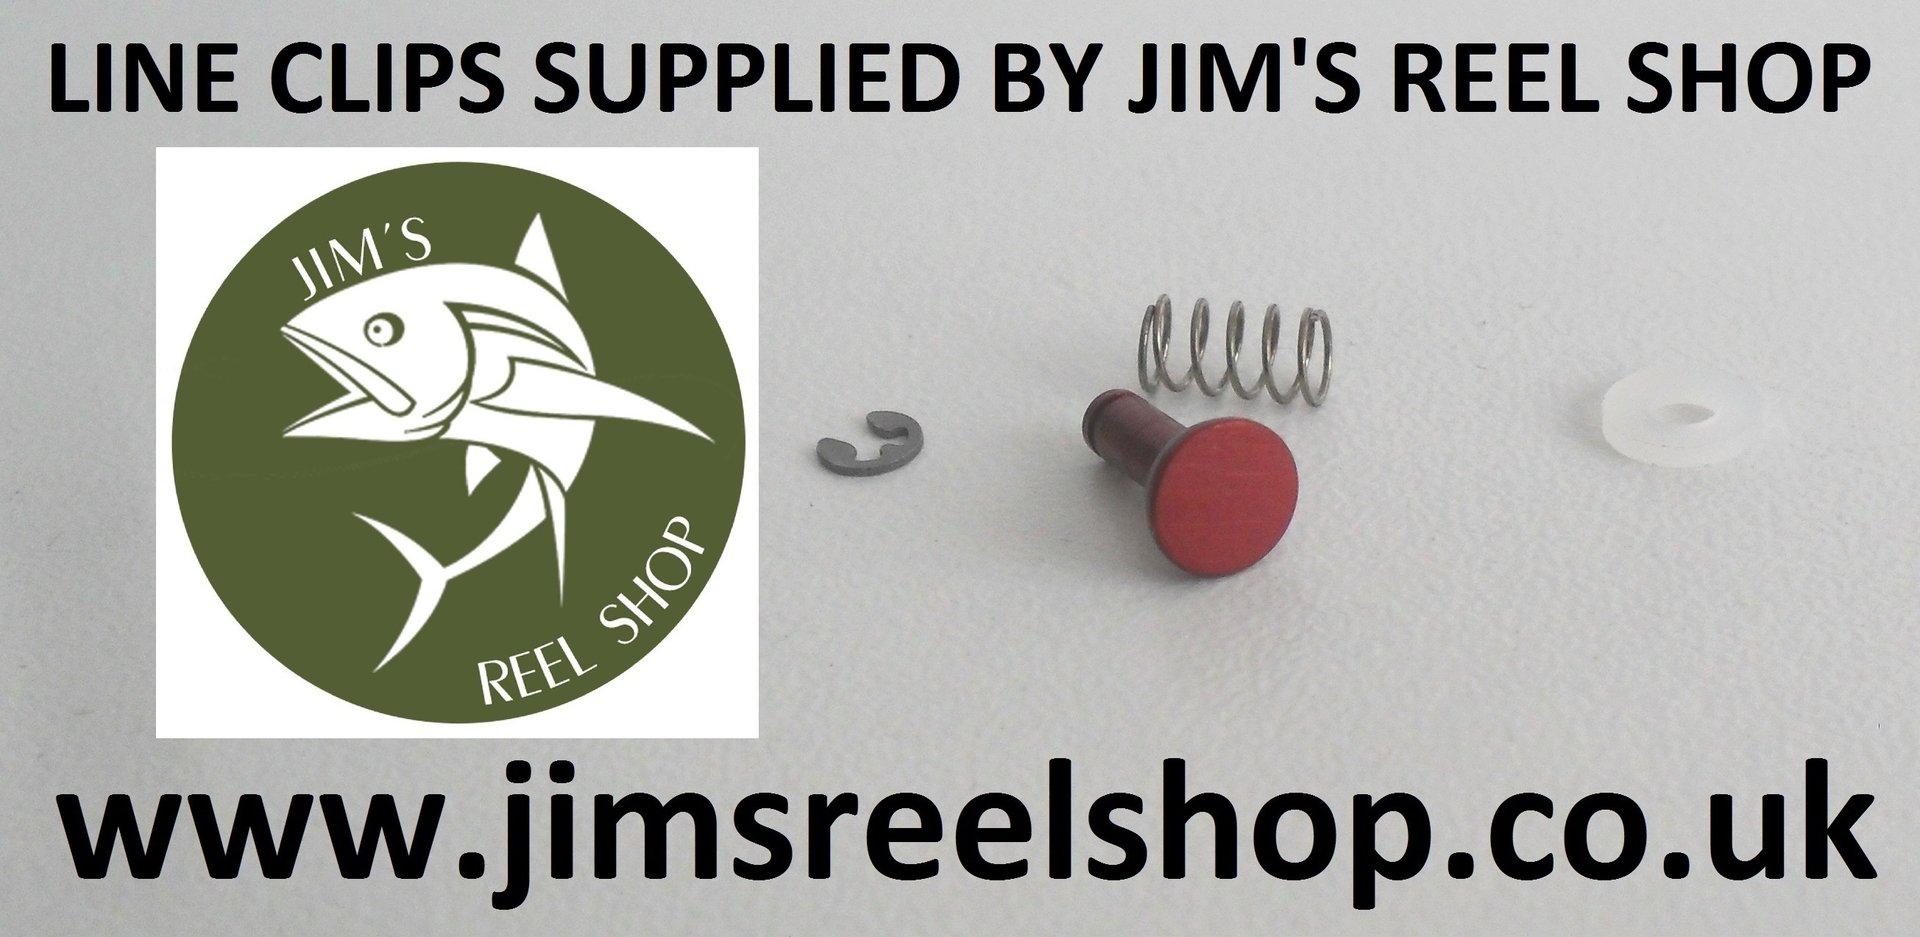 4688a3a0a57 RED LINE CLIPS 4 DAIWA EMBLEM S-H-X & LONGBEAMH - Jim's Reel Shop